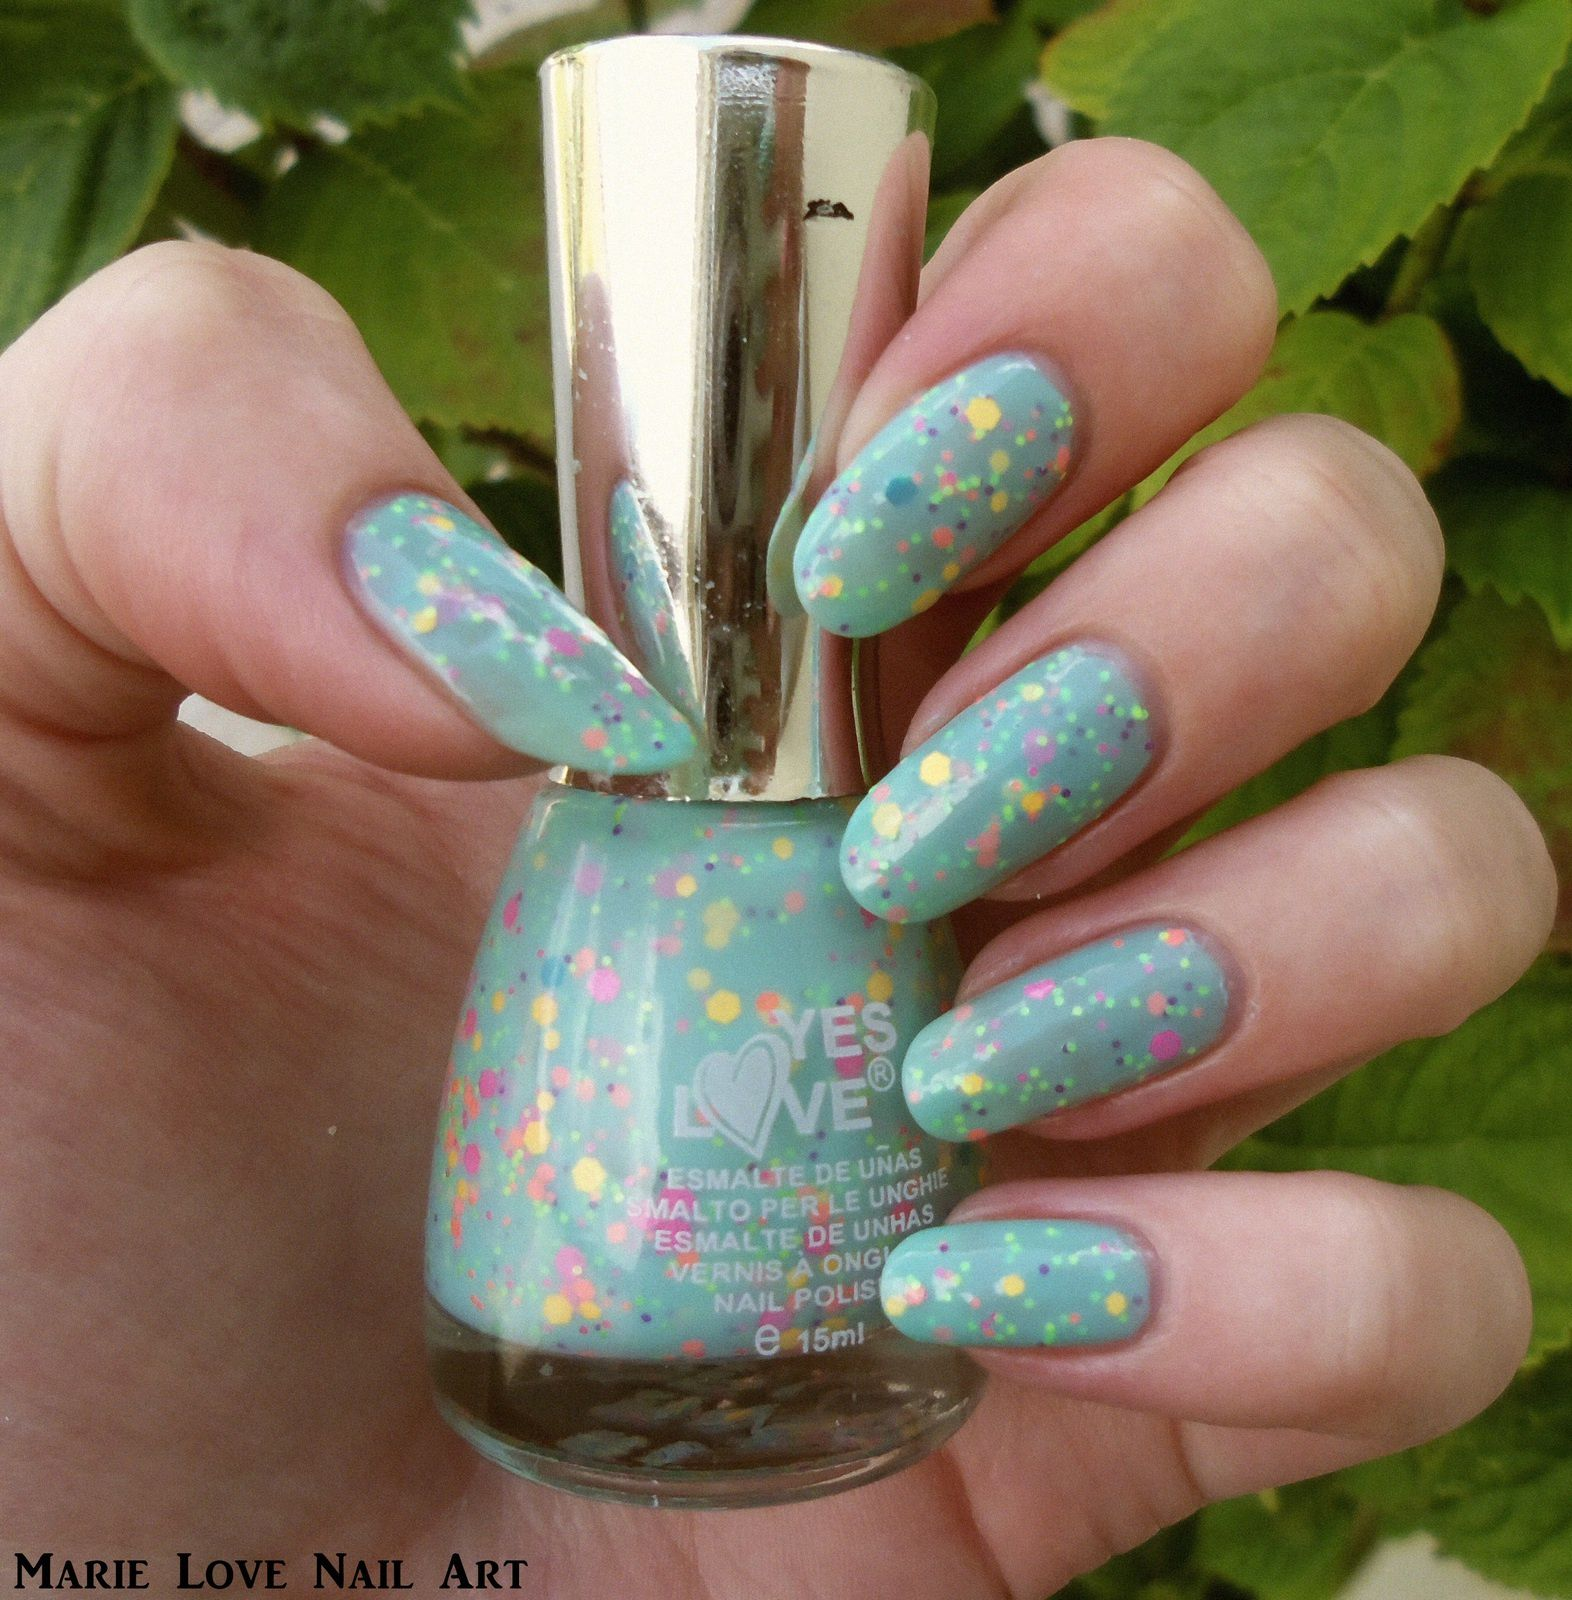 Yes Love - Neon Glitter